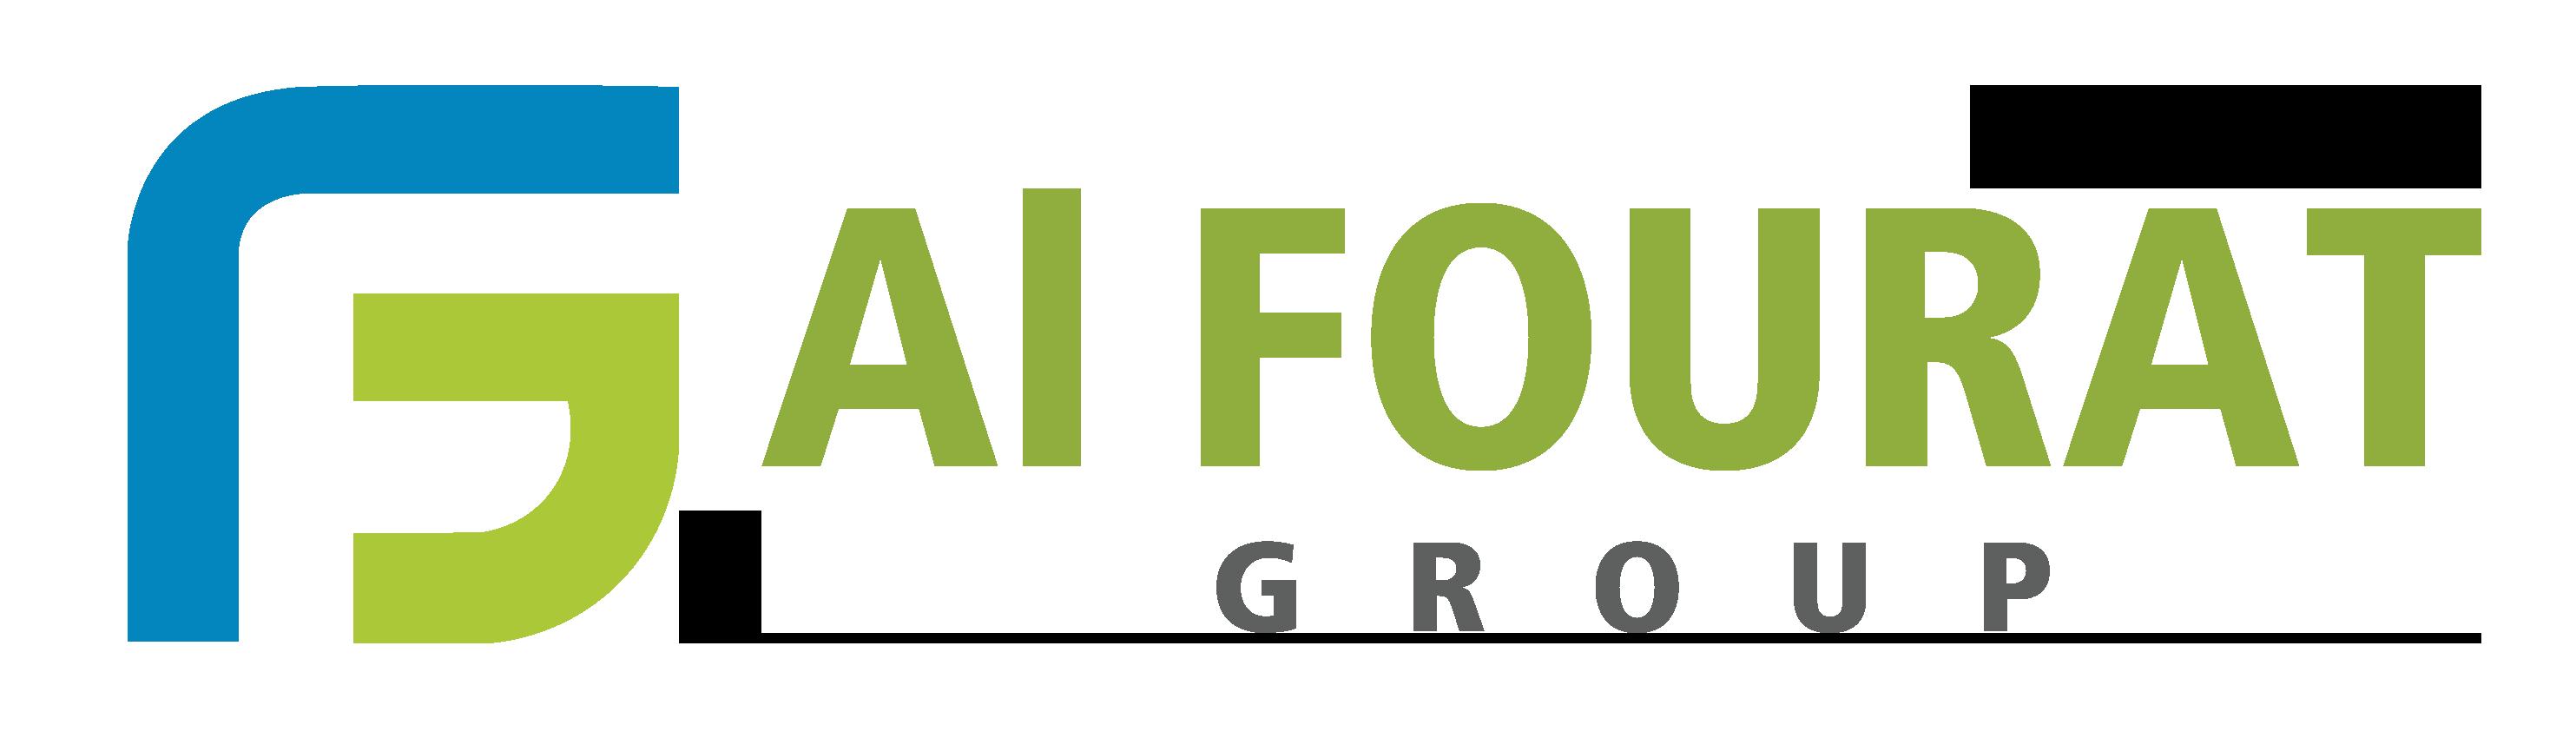 Al Fourat Group